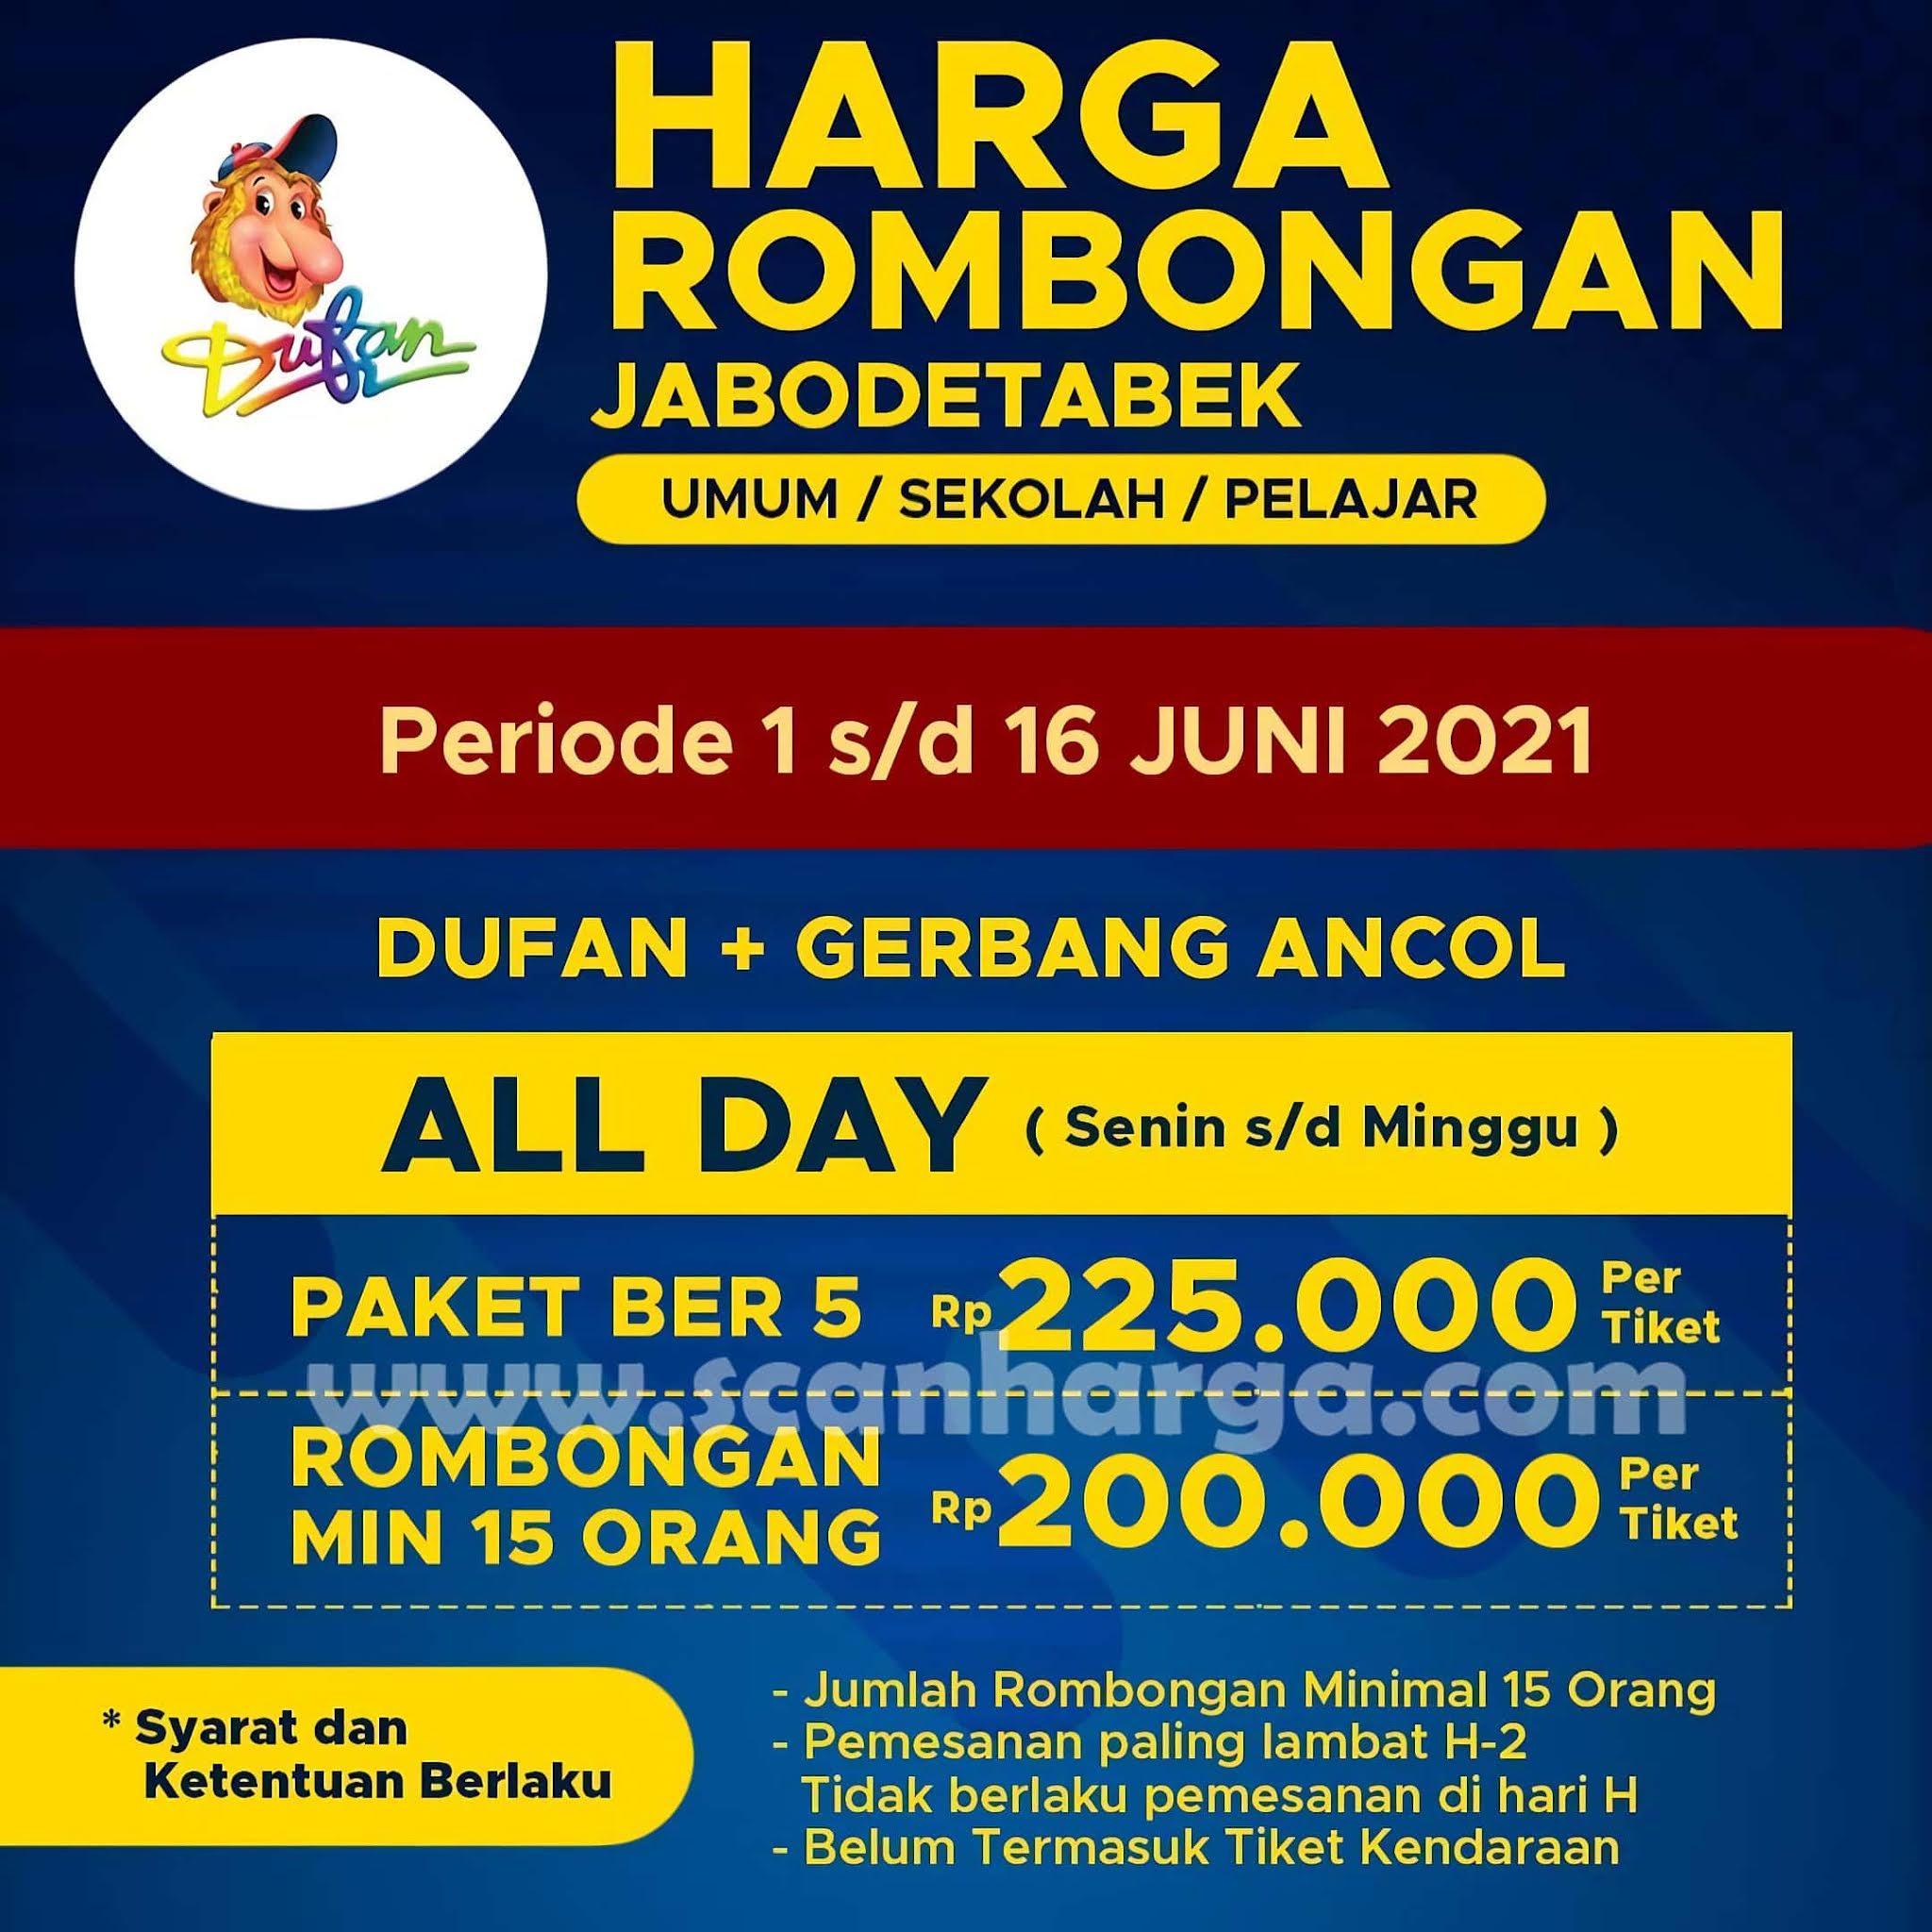 Promo DUFAN Harga Tiket Rombongan JUNI 2021